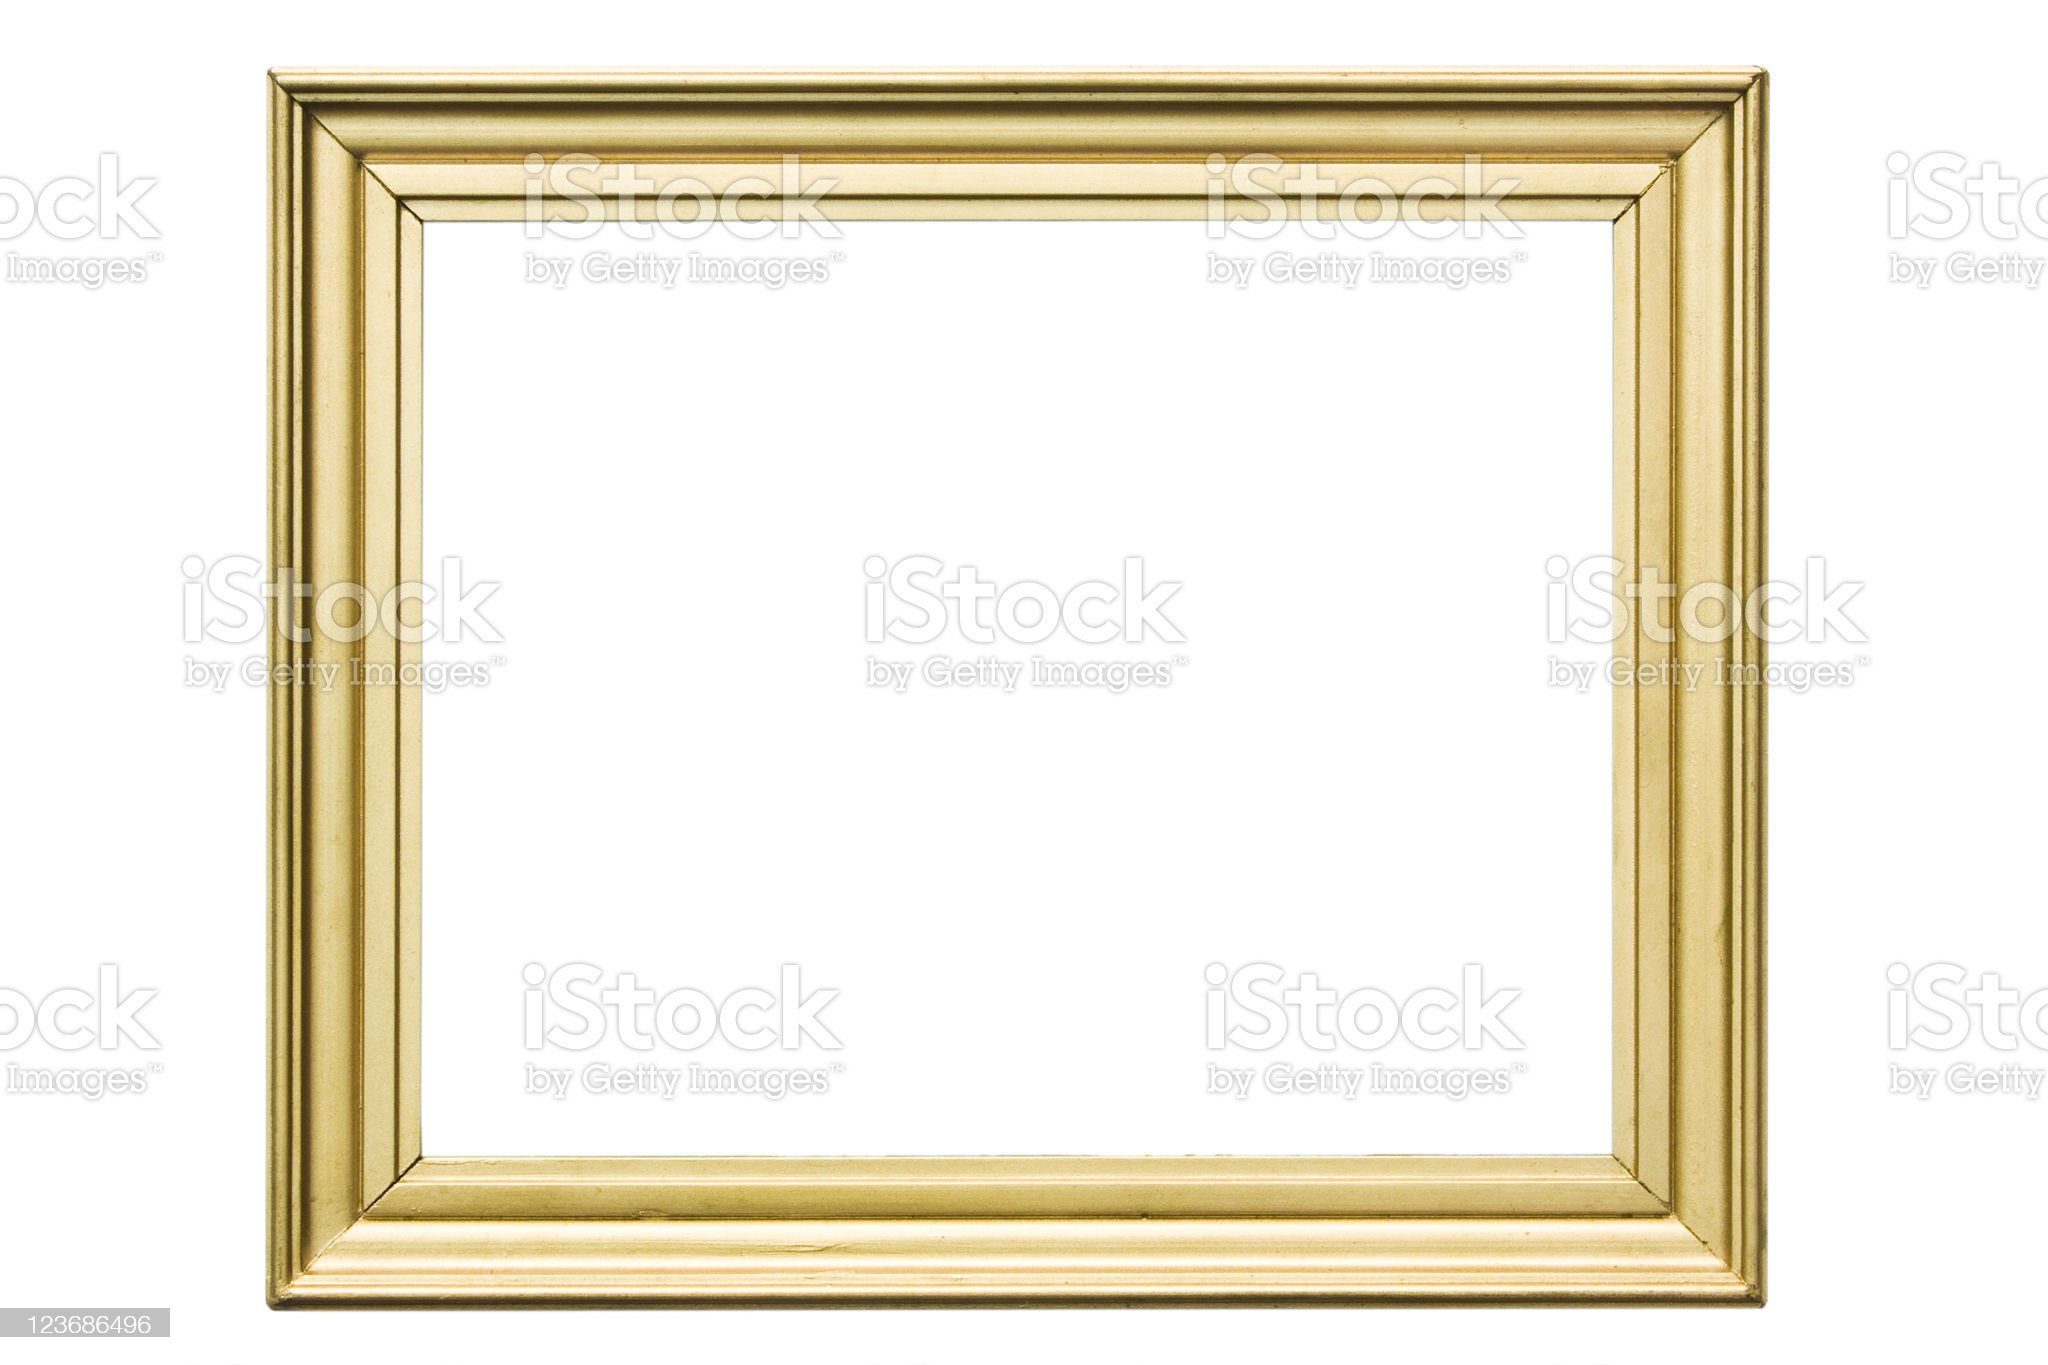 vintage golden frame royalty-free stock photo